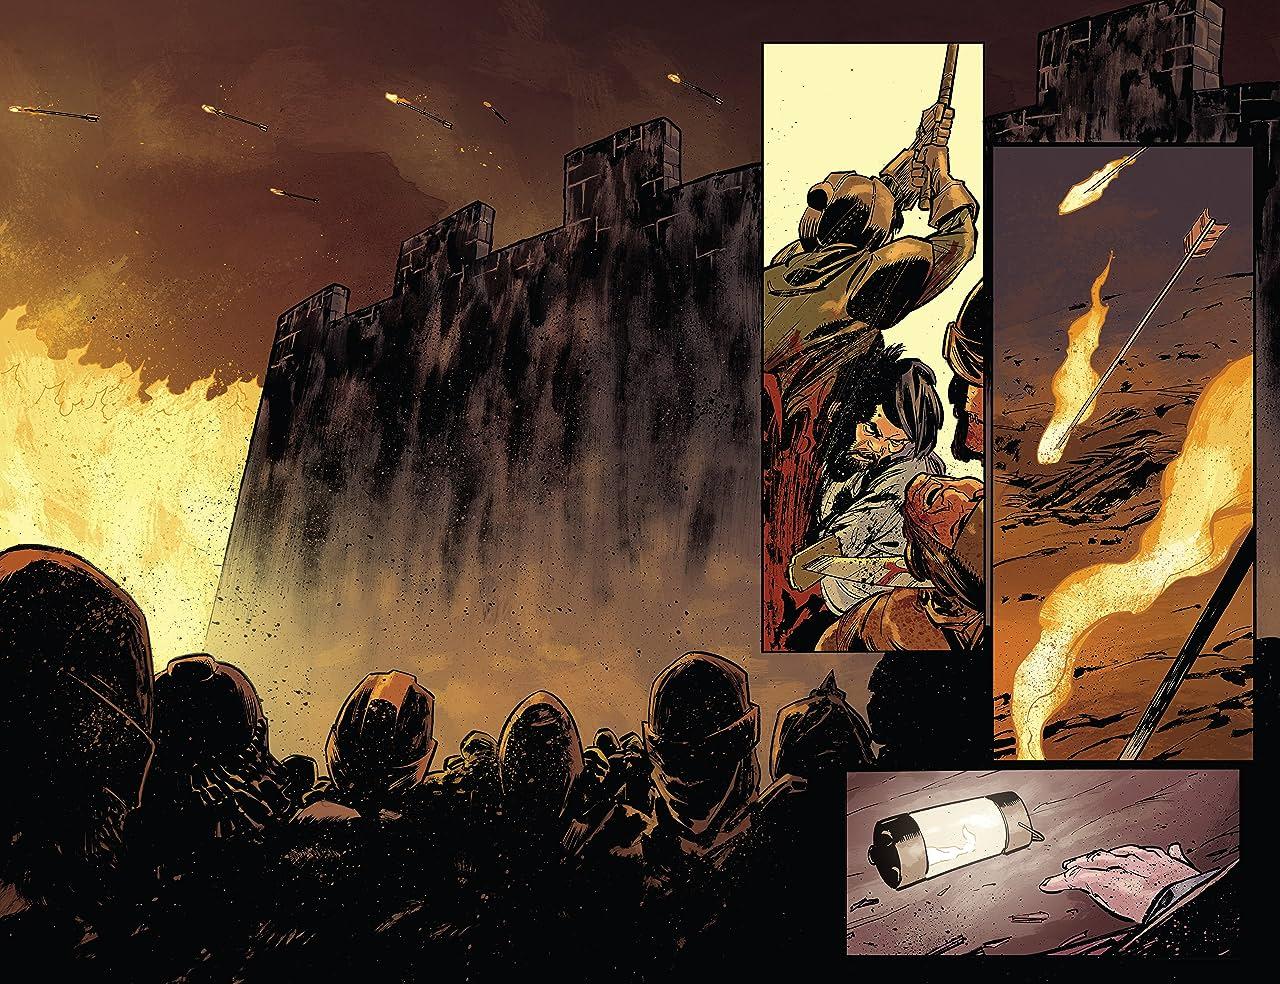 The Last Siege #7